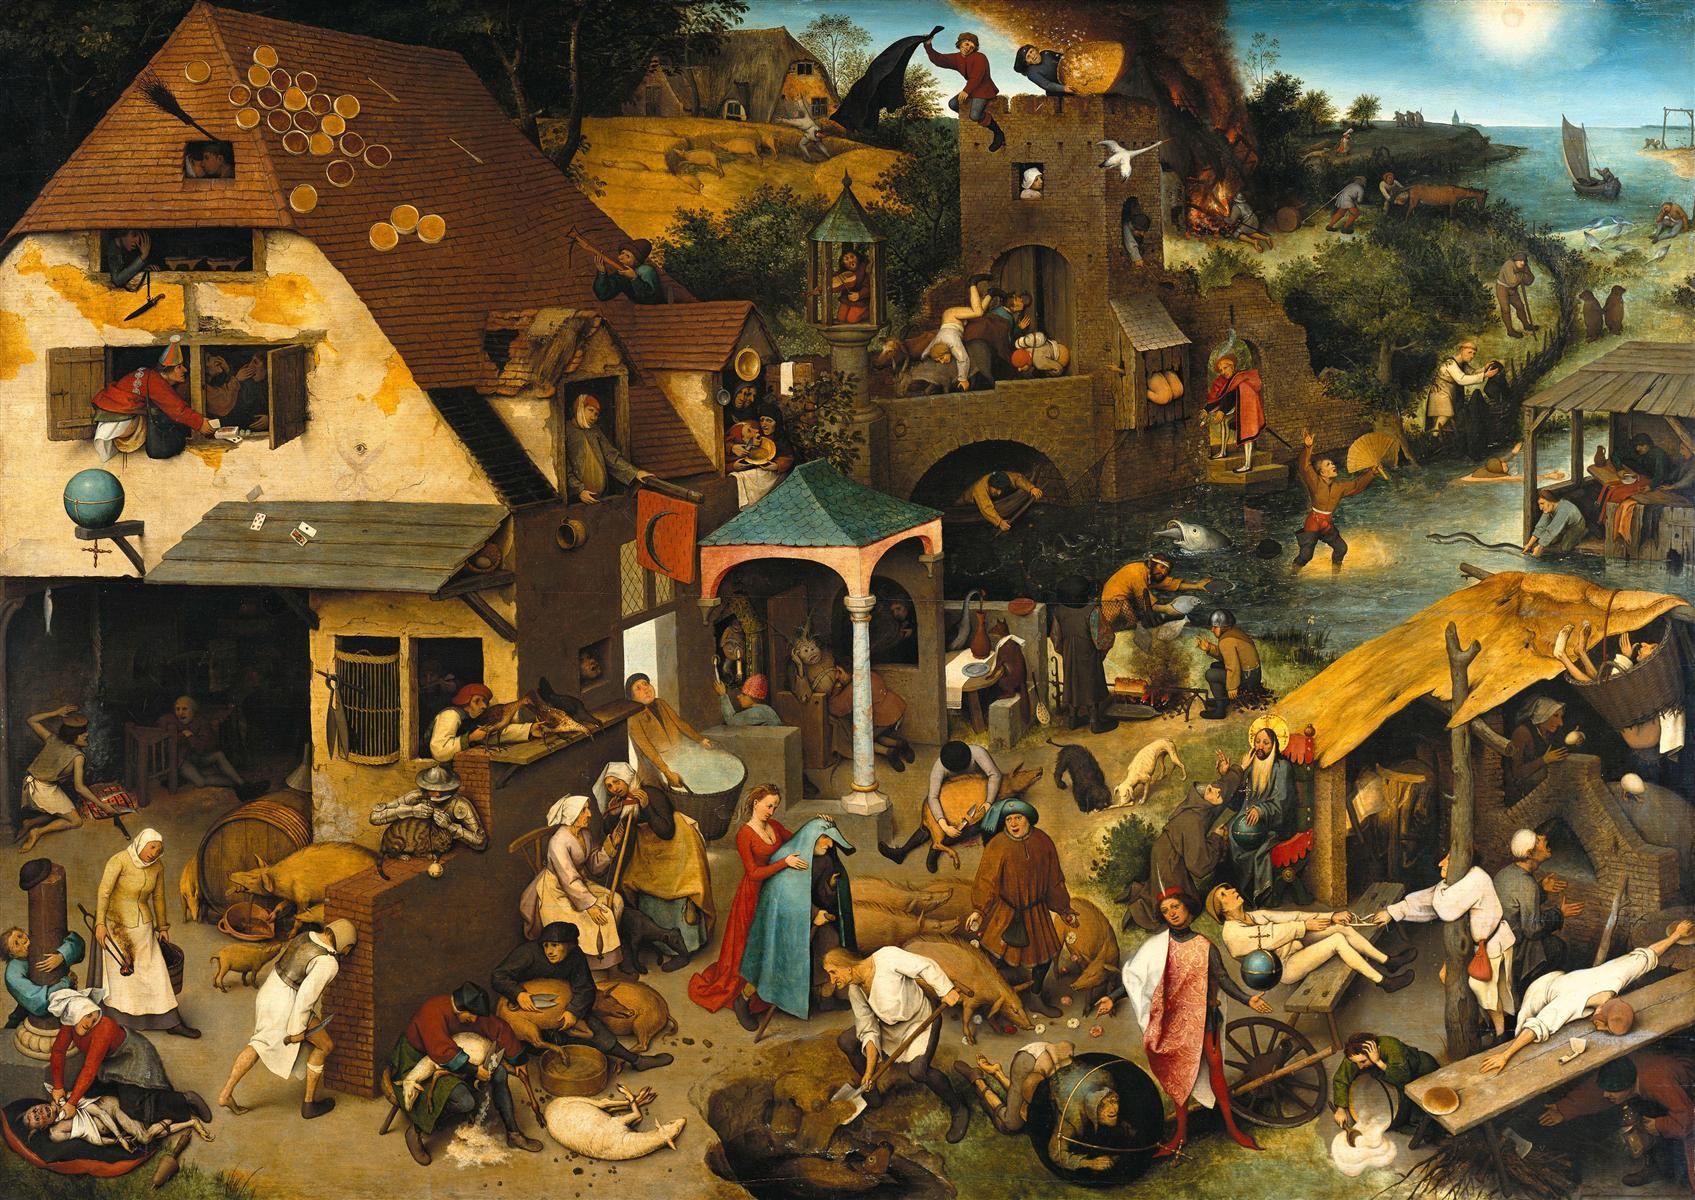 http://uploads2.wikipaintings.org/images/pieter-bruegel-the-elder/netherlandish-proverbs-1559.jpg!HD.jpg